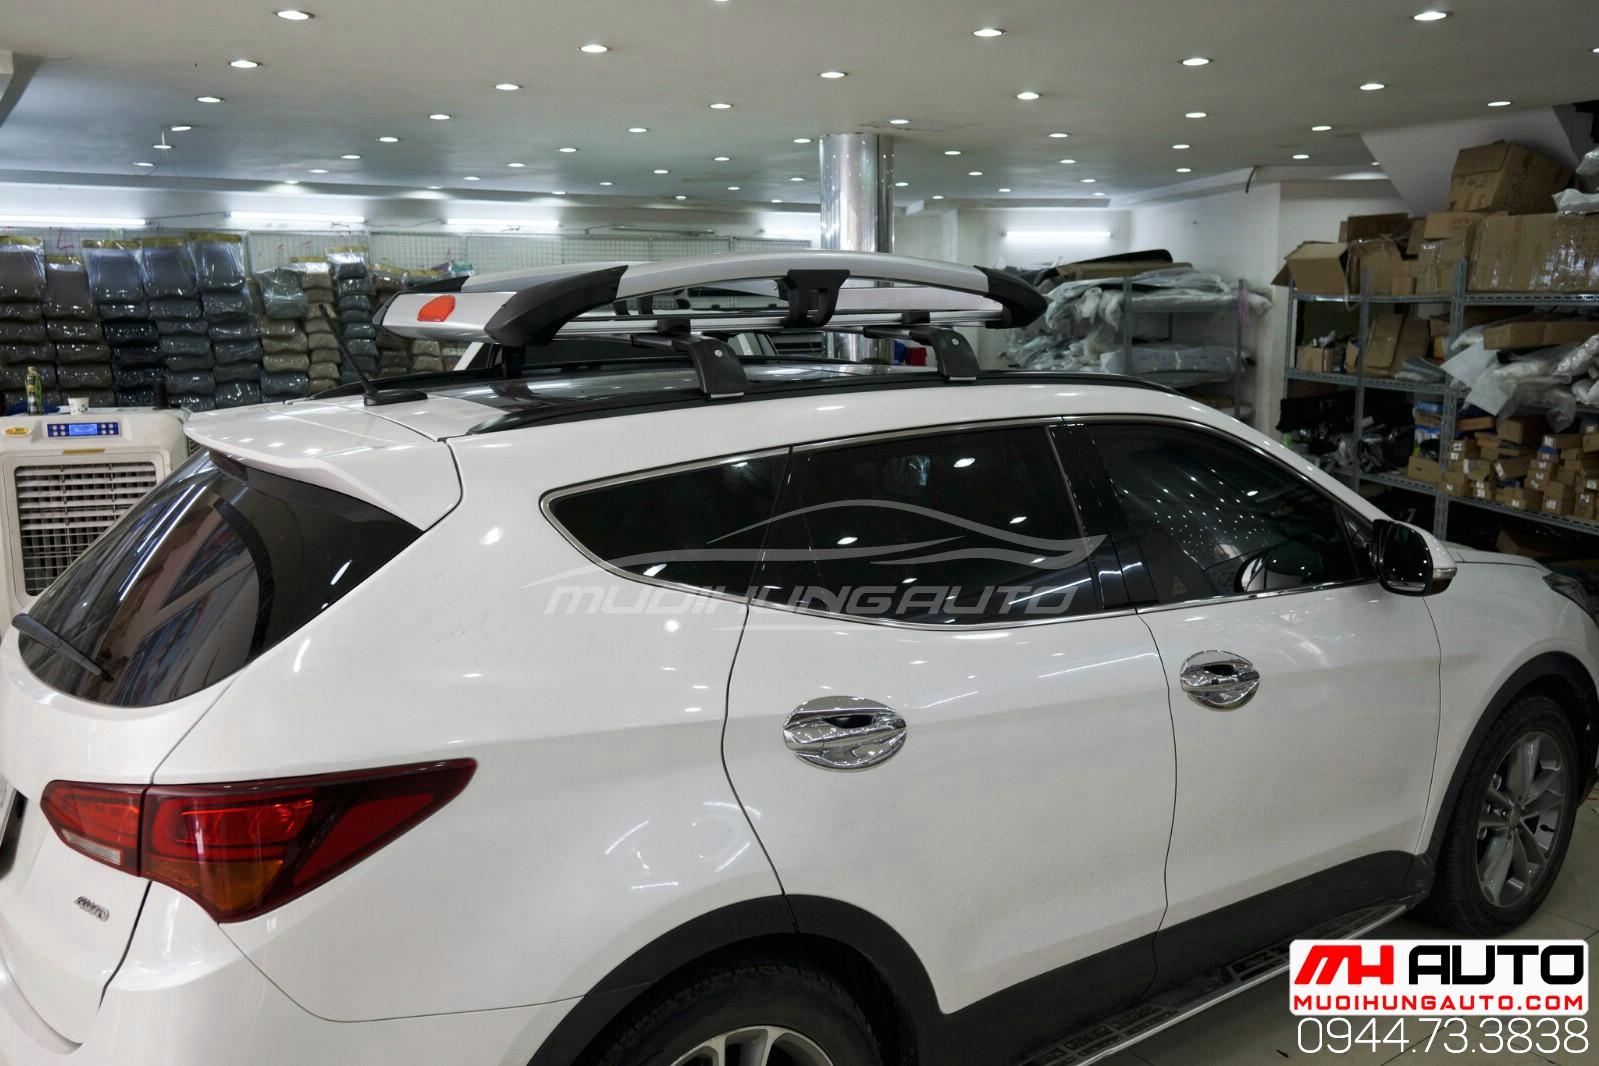 Gắn phụ kiện baga mui để đồ xe Hyundai Santafe 2018